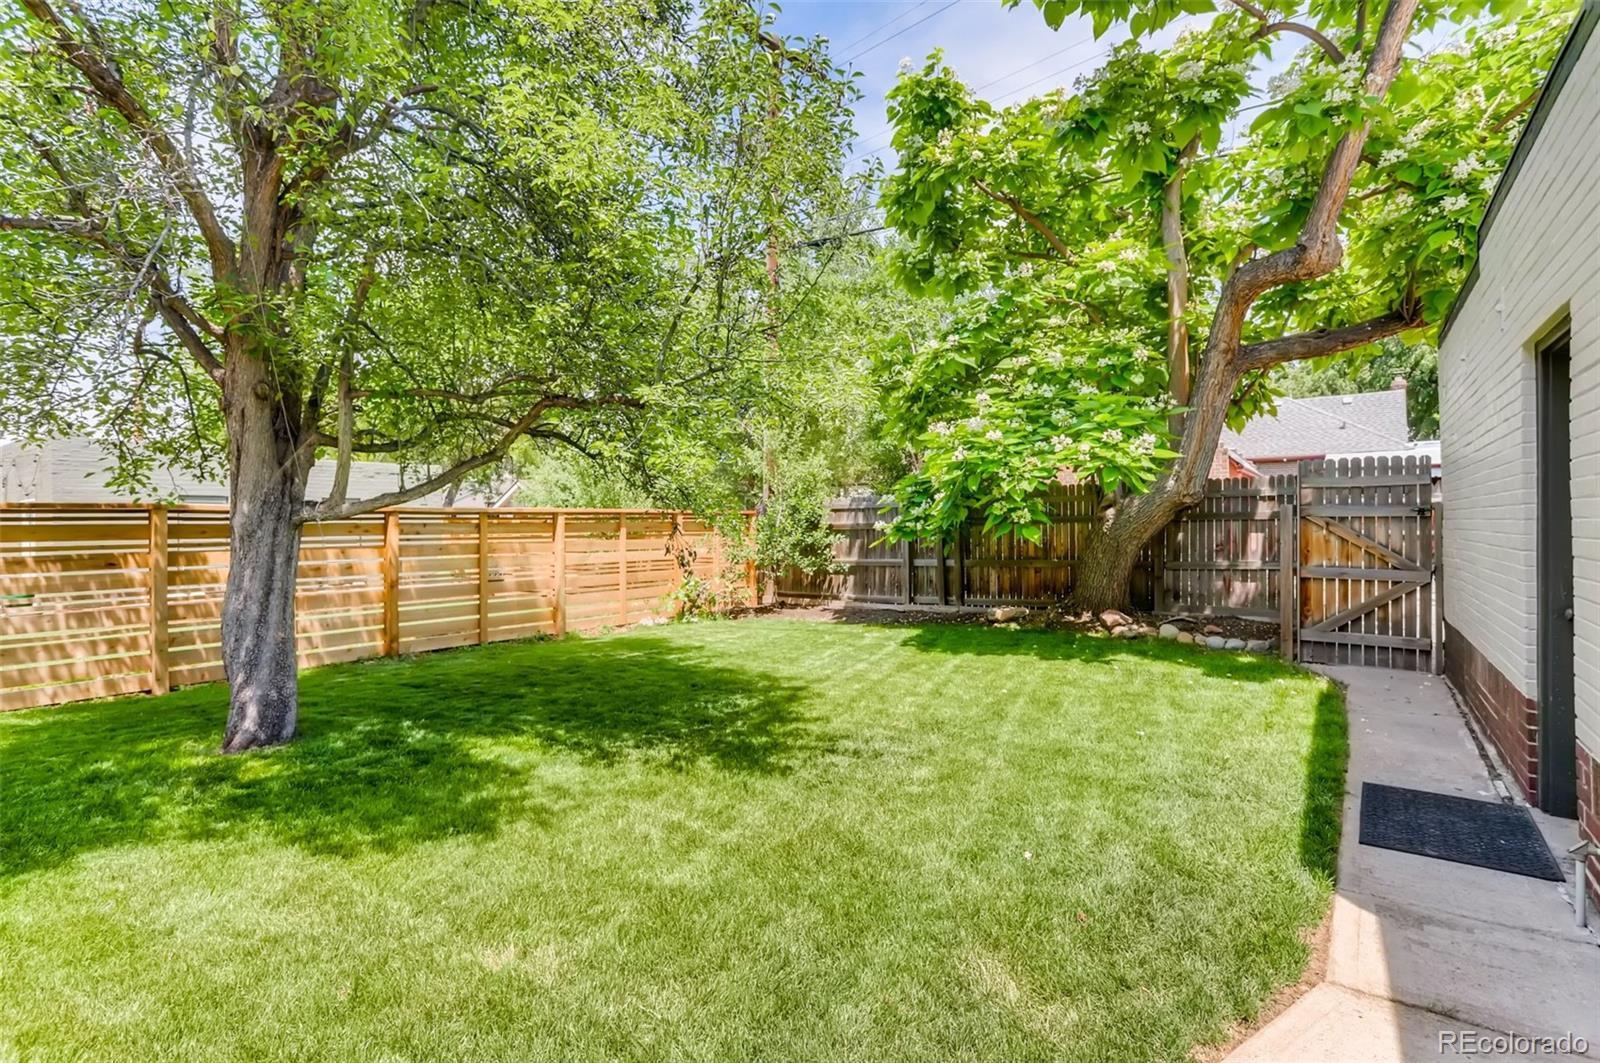 MLS# 3664443 - 26 - 1414 Forest Street, Denver, CO 80220